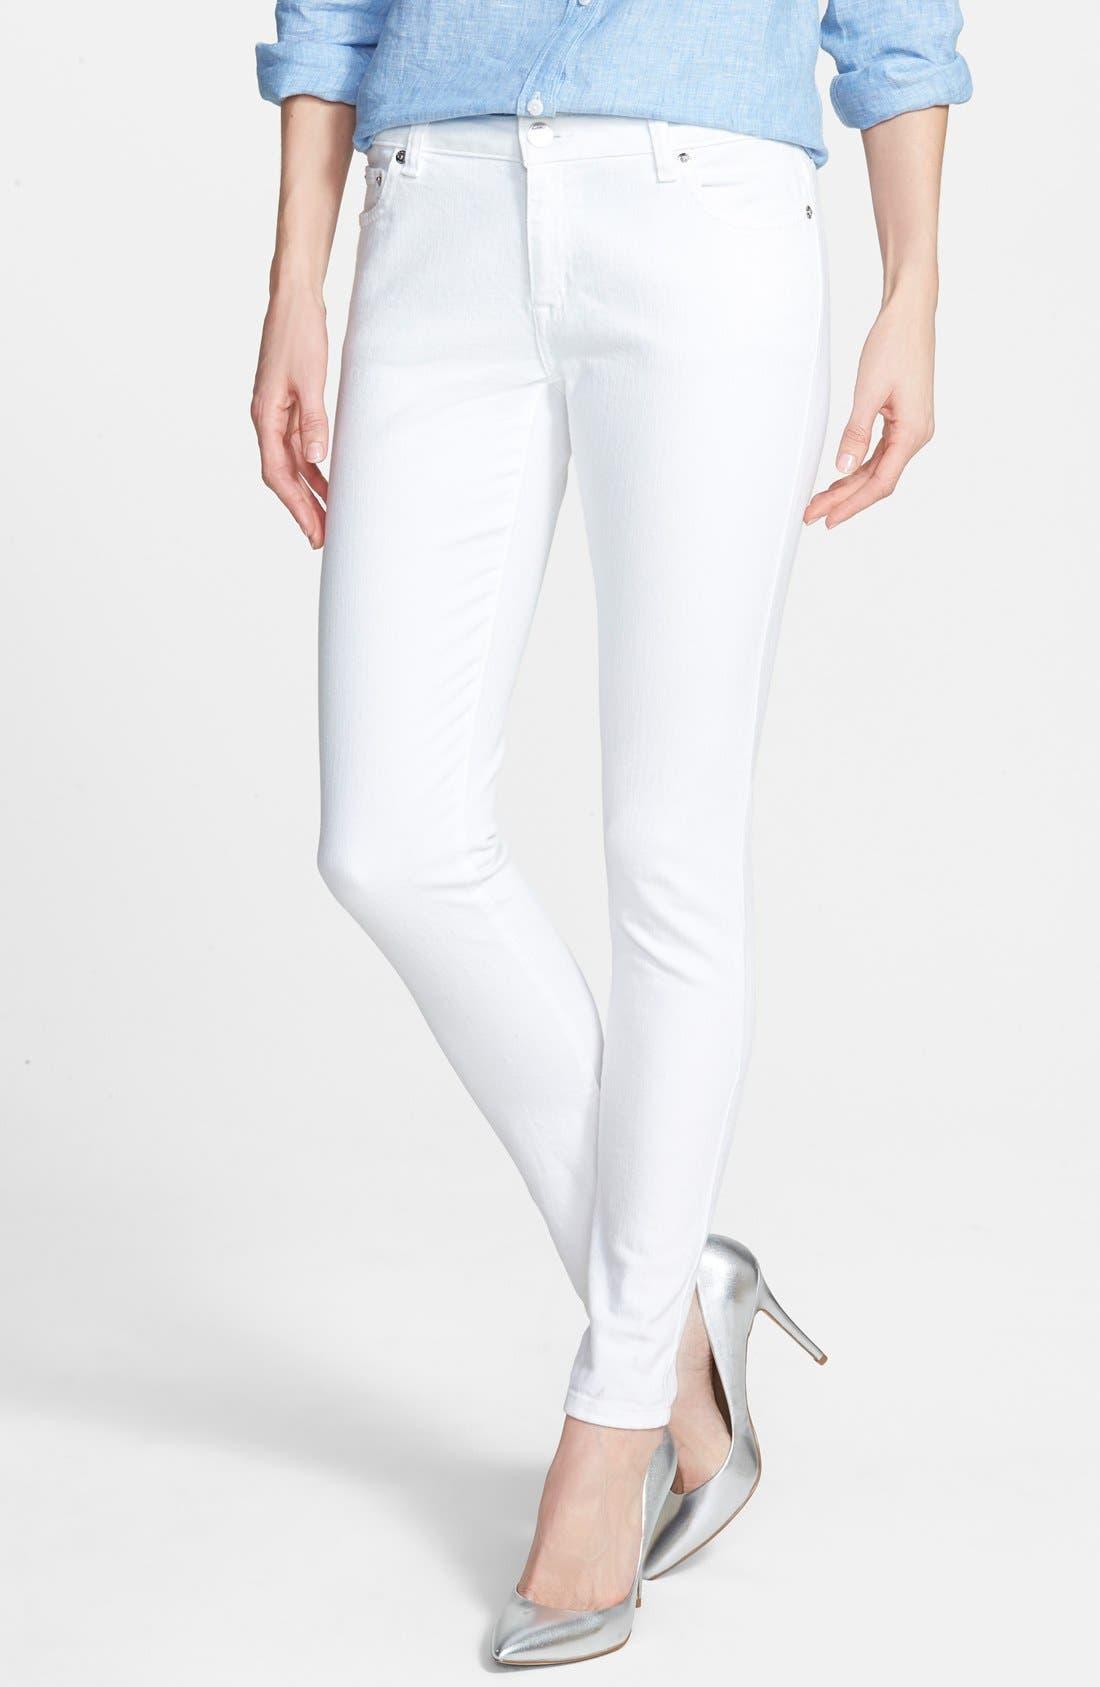 Main Image - MICHAEL Michael Kors White Skinny Jeans